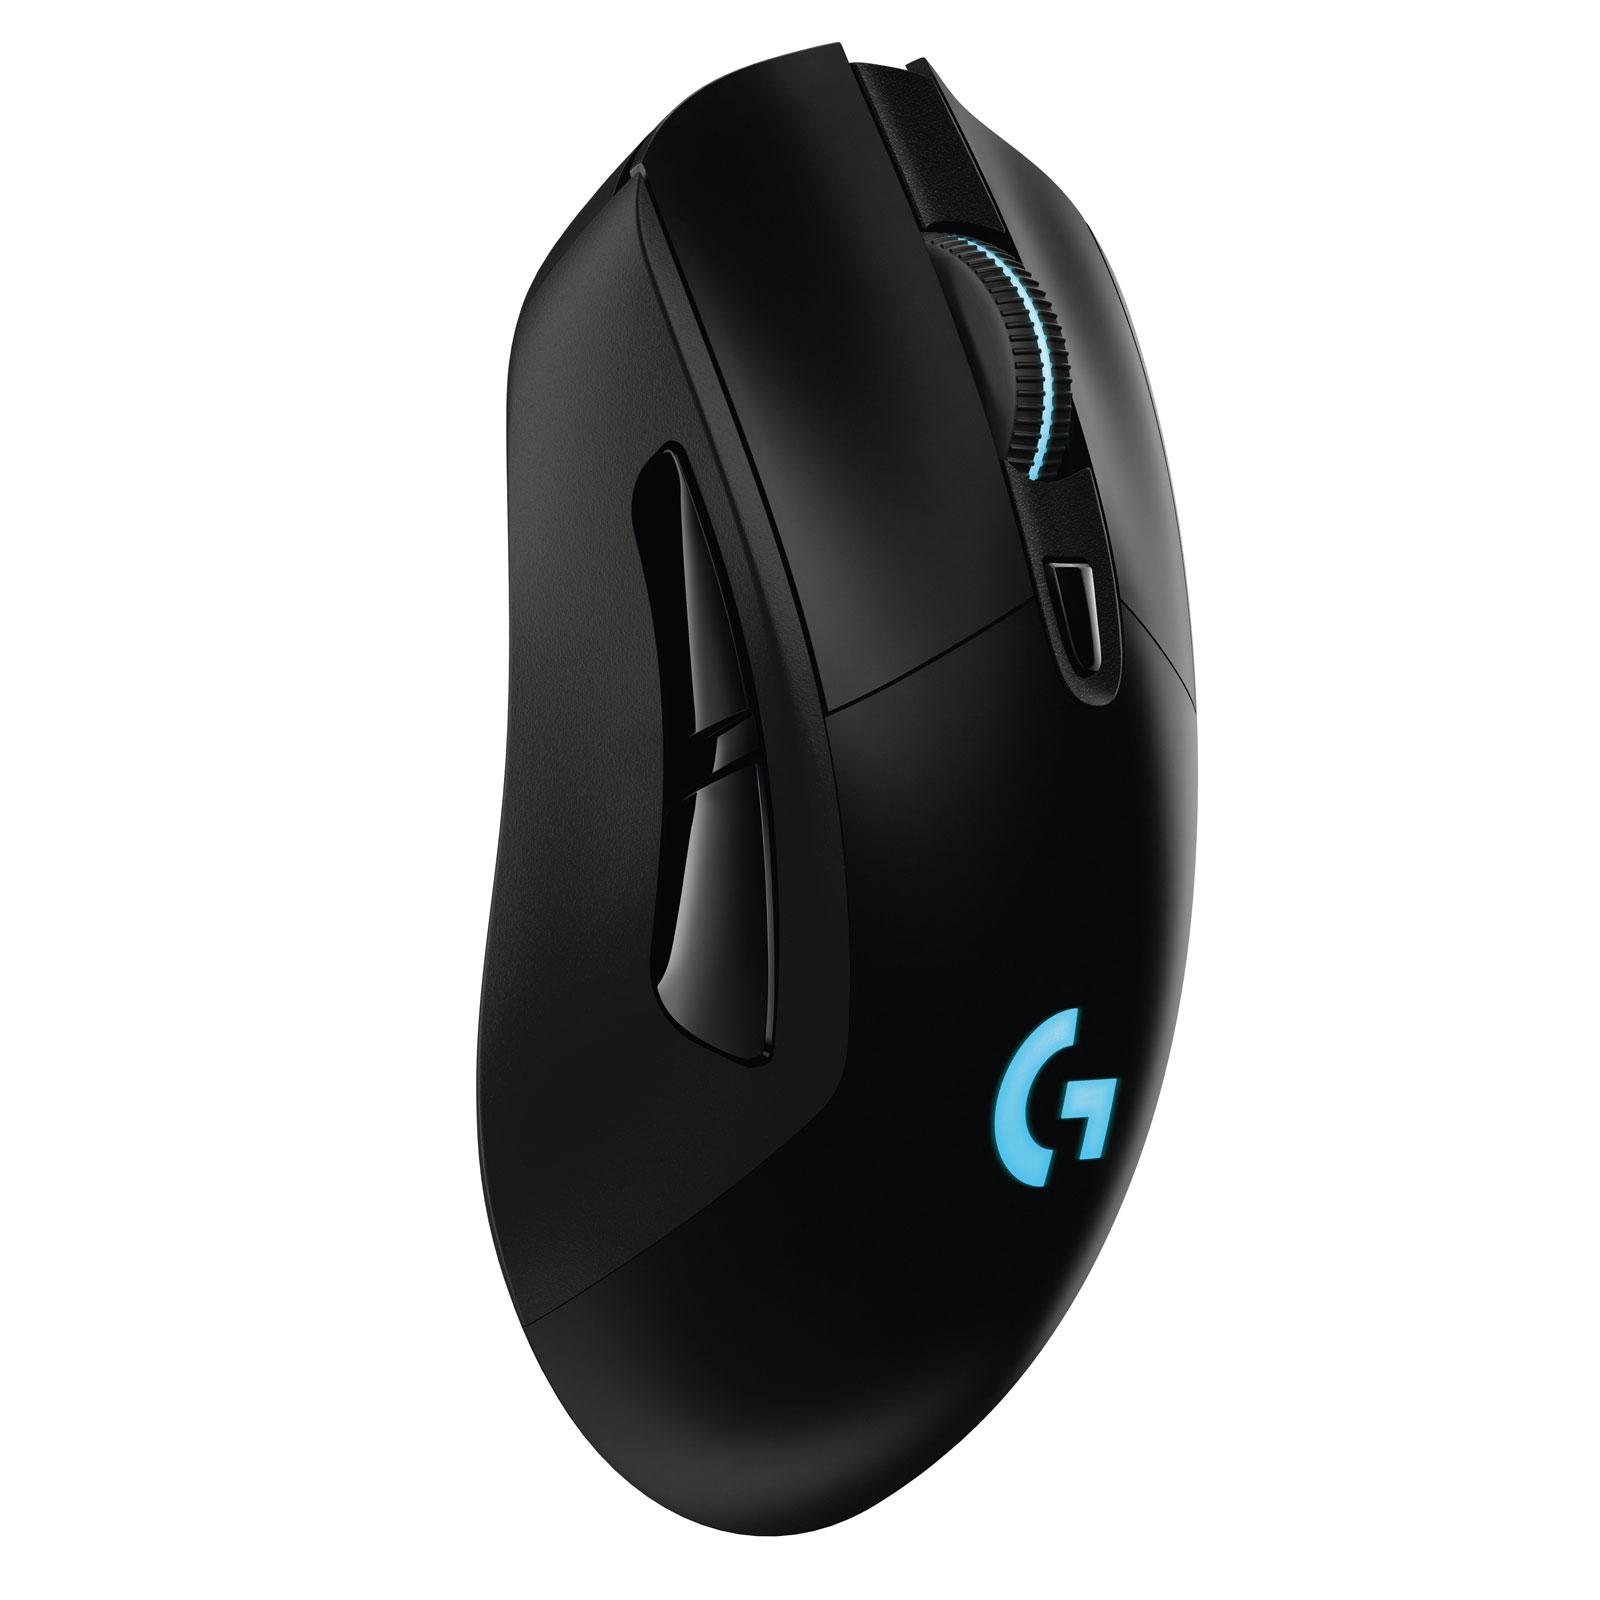 Logitech G403 Wireless - Souris PC Logitech - Cybertek.fr - 4